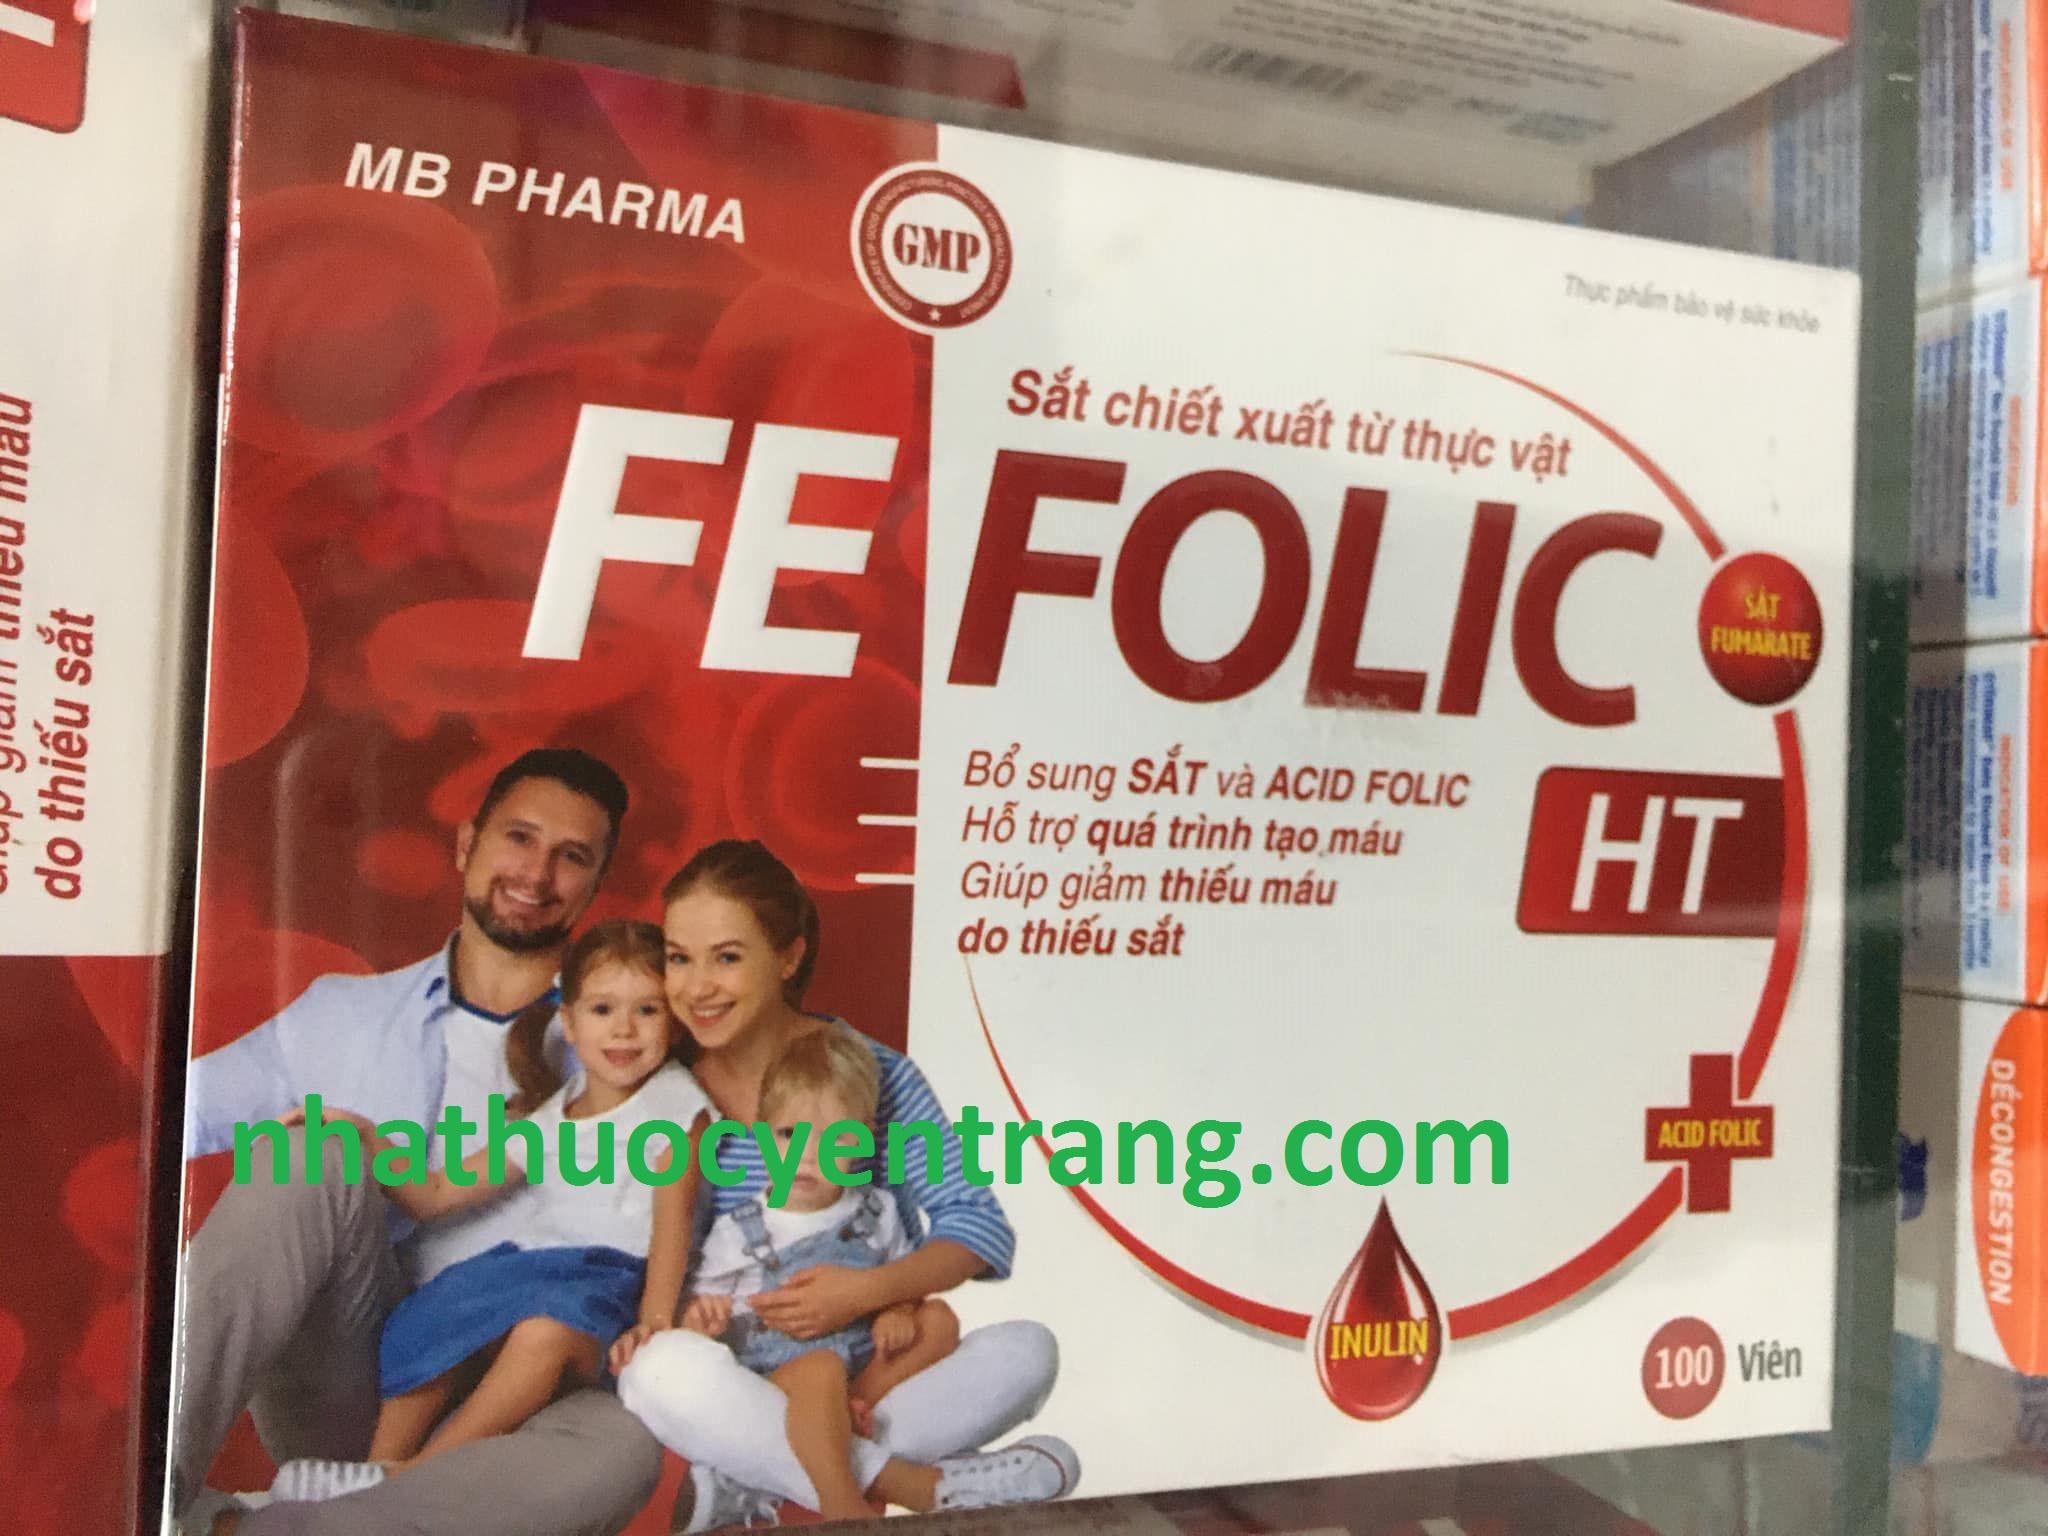 Fe Folic